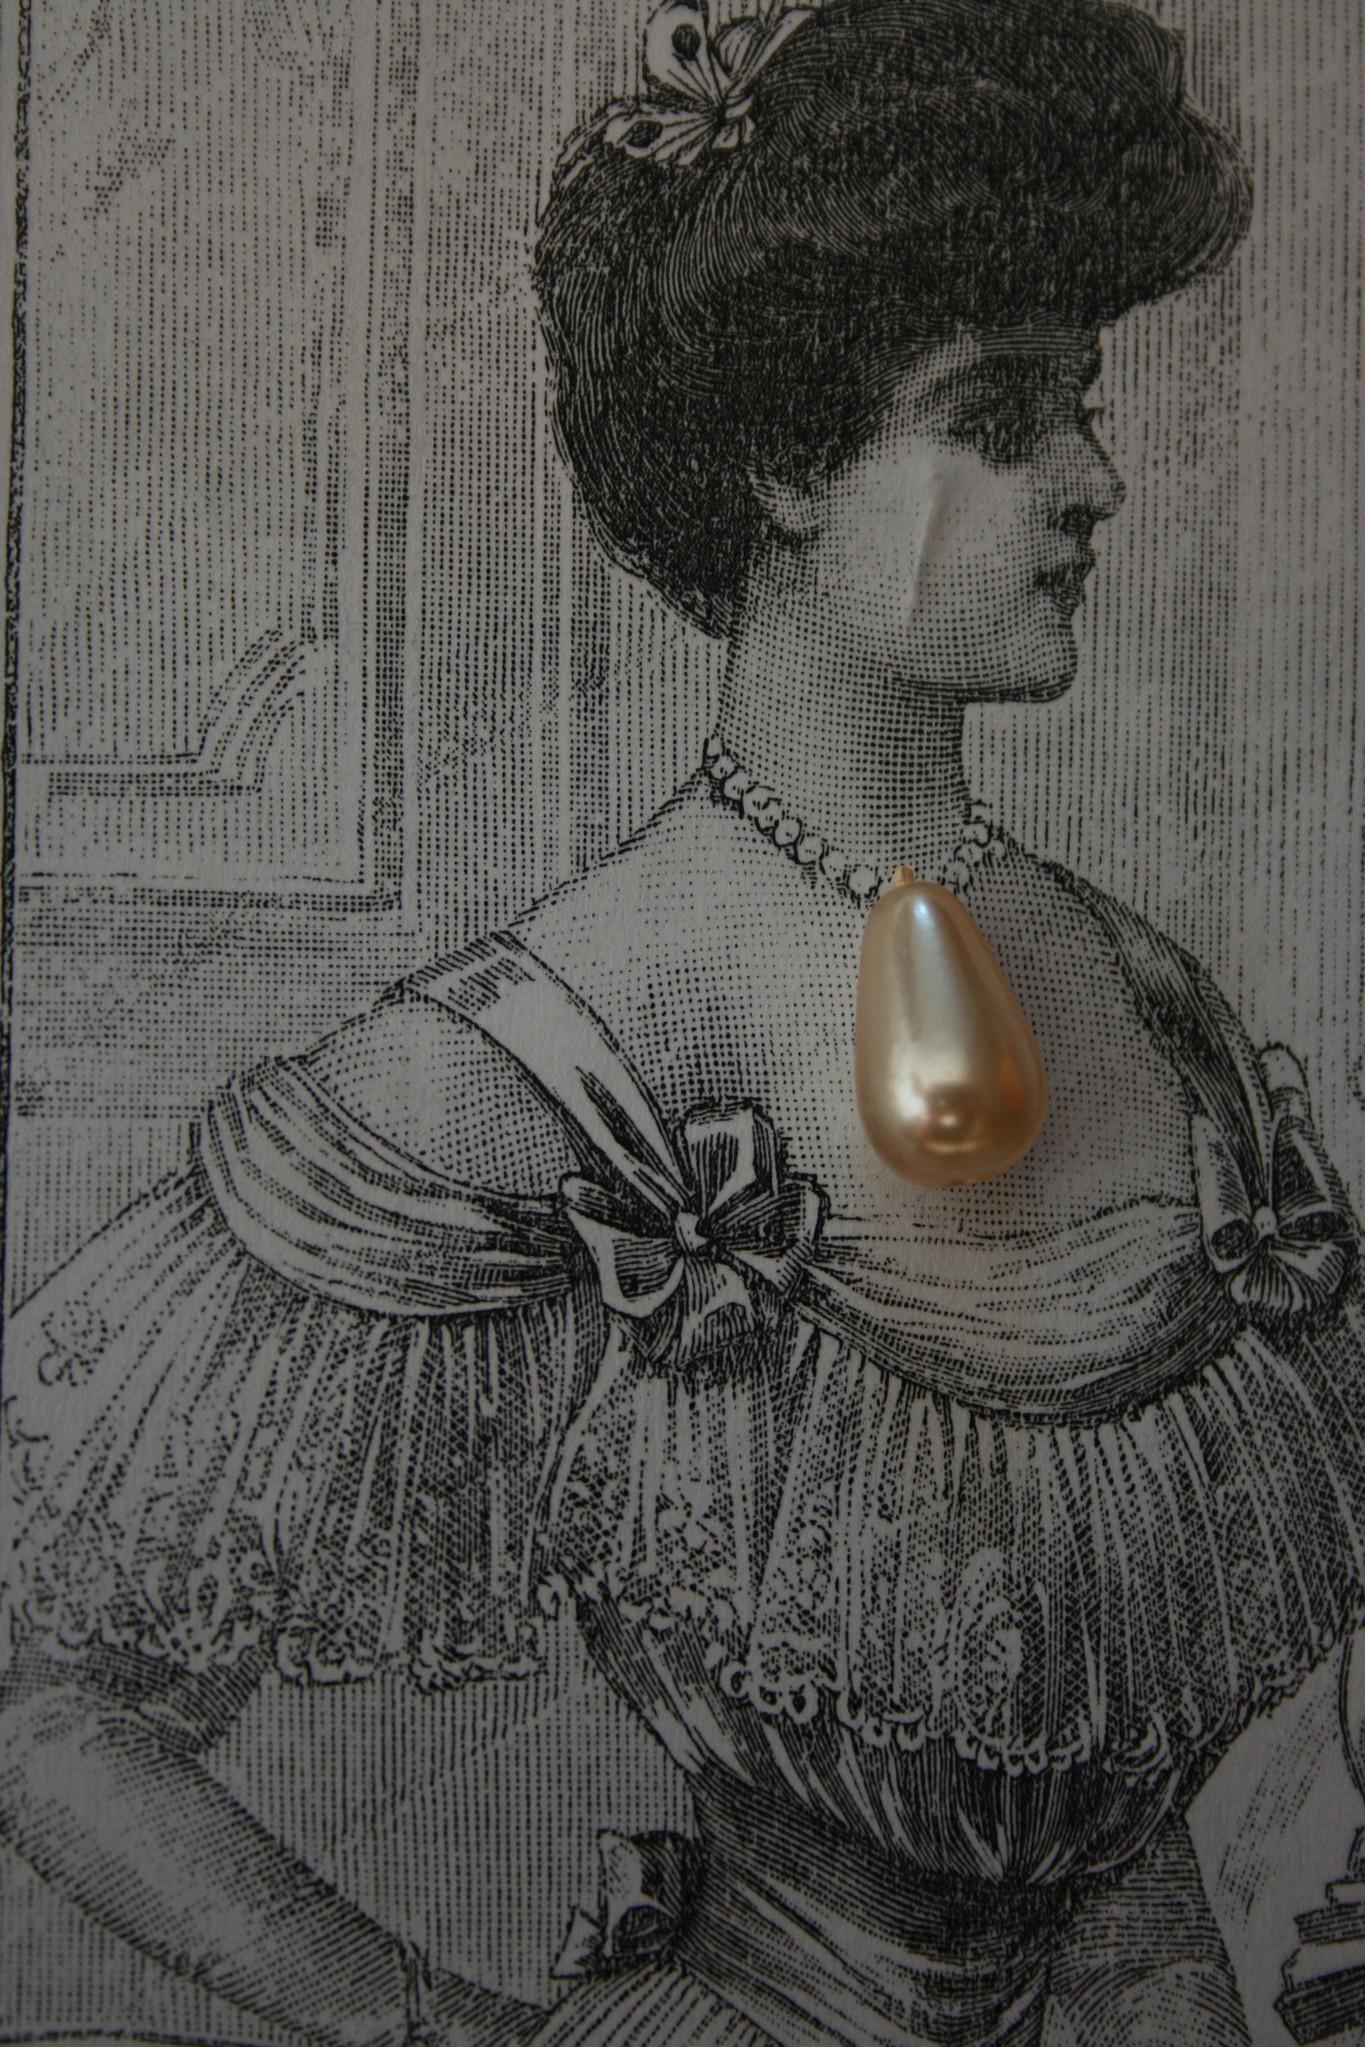 Gutermann teardrop pearls.